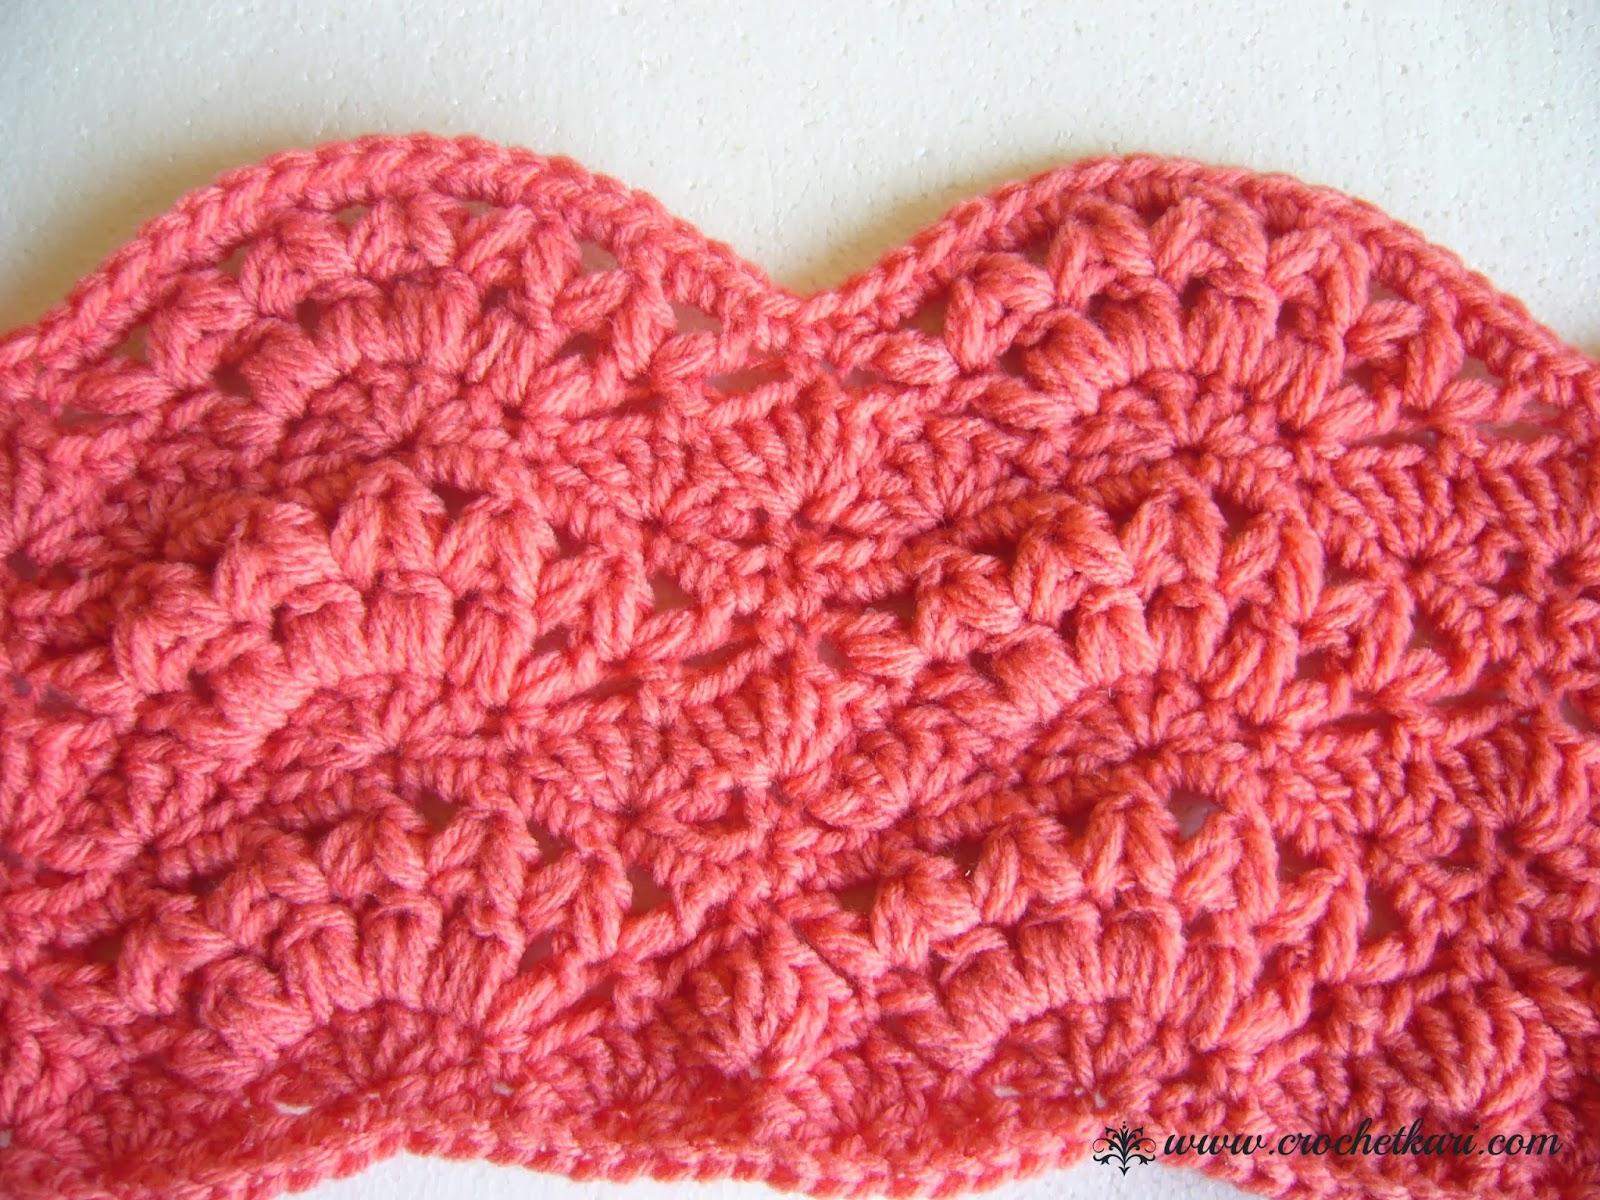 Salmon crochet cawl detail